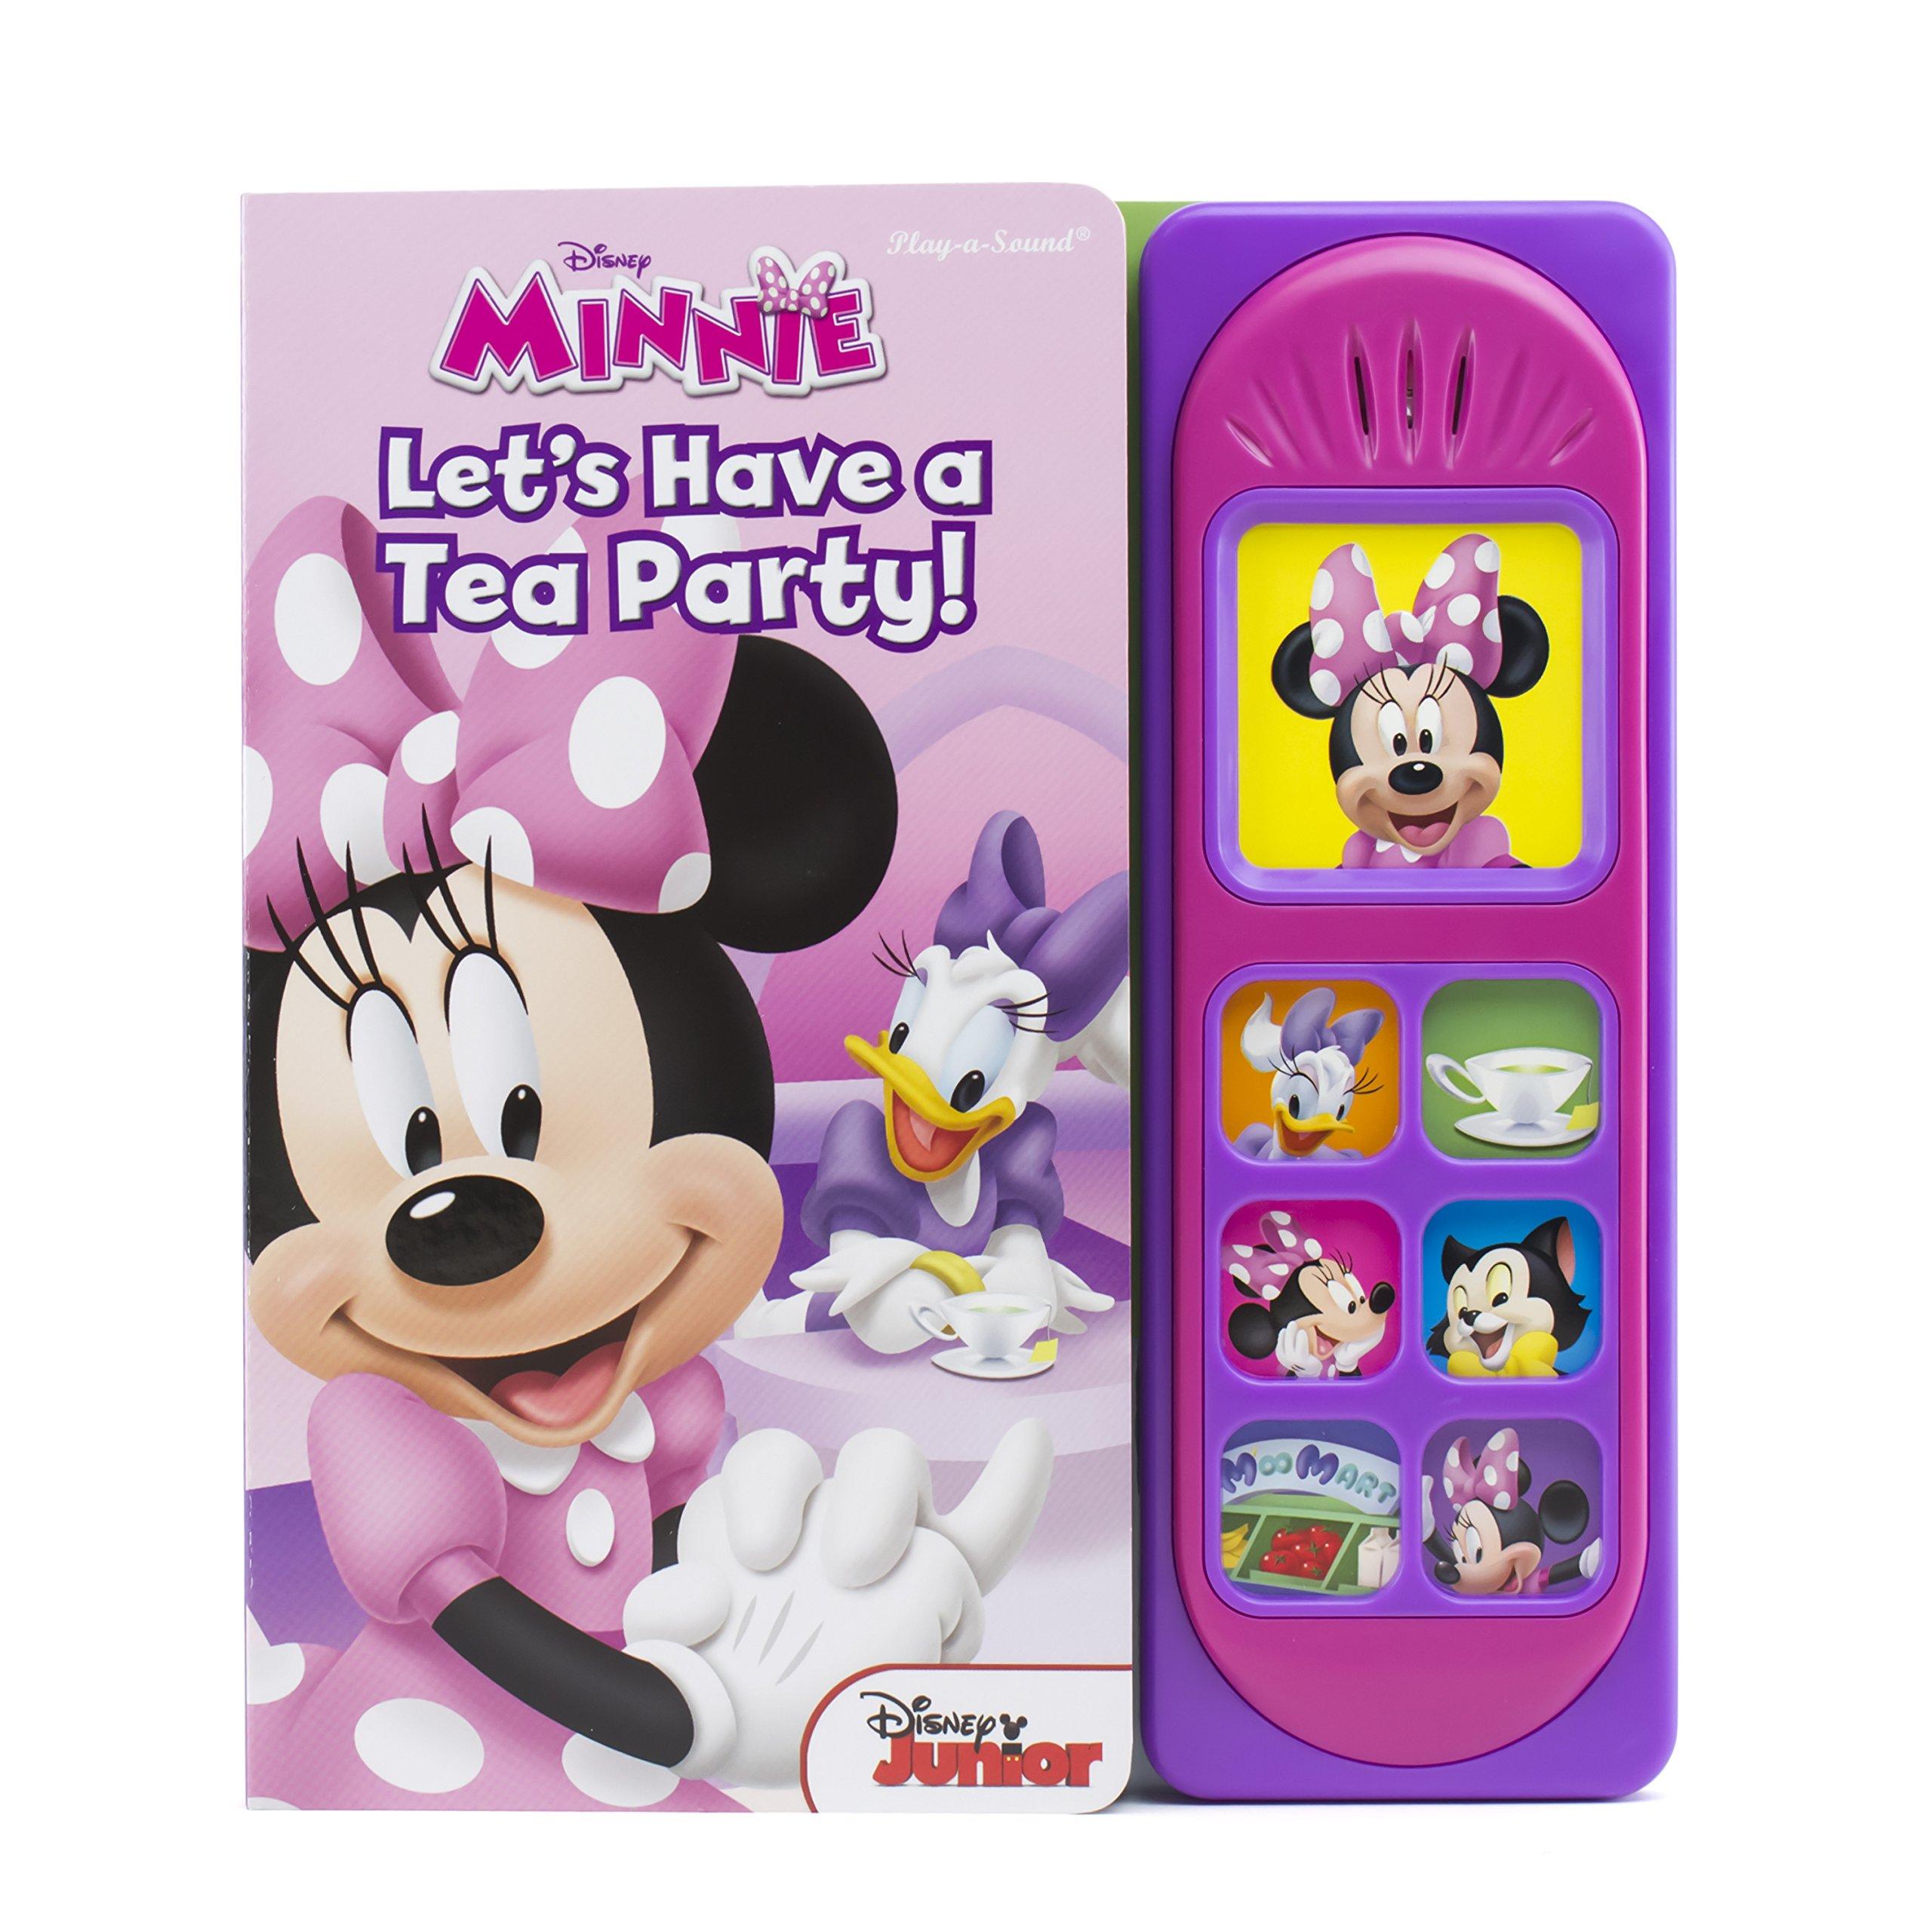 Minnie Mouse: Let's Have a Tea Party! Little Sound Book - PI Kids (Play-a-sound: Disney Minnie)